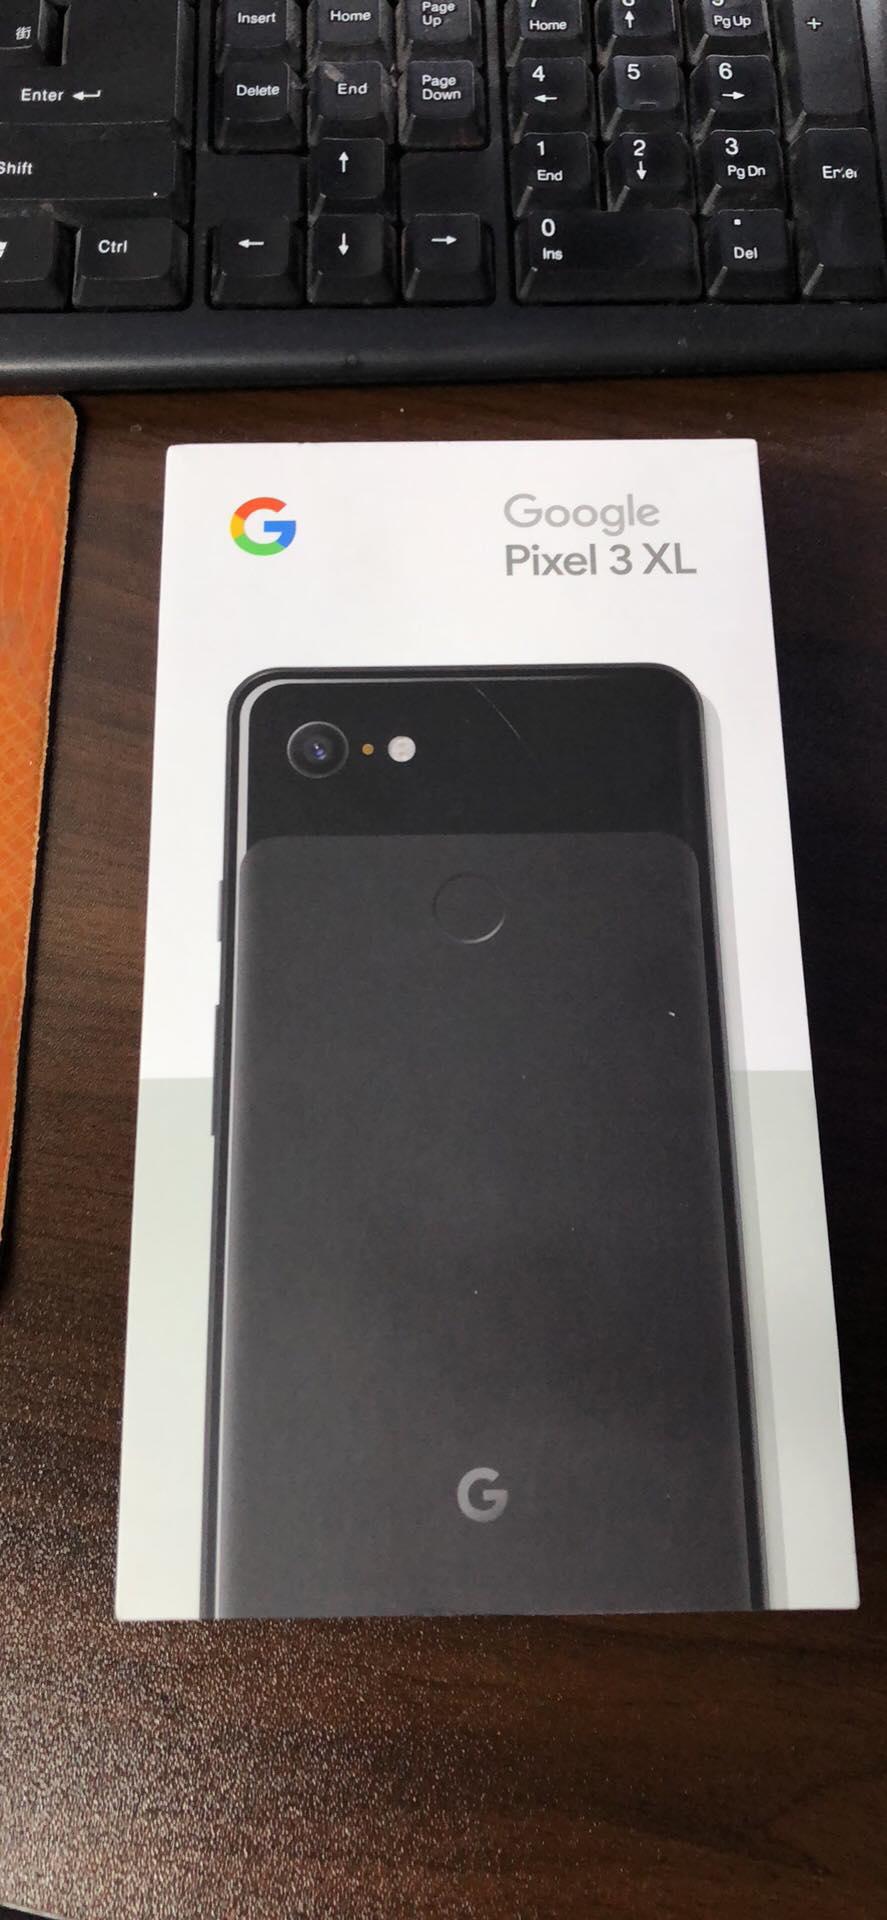 Photos of Google Pixel 3 installed apps, retail box